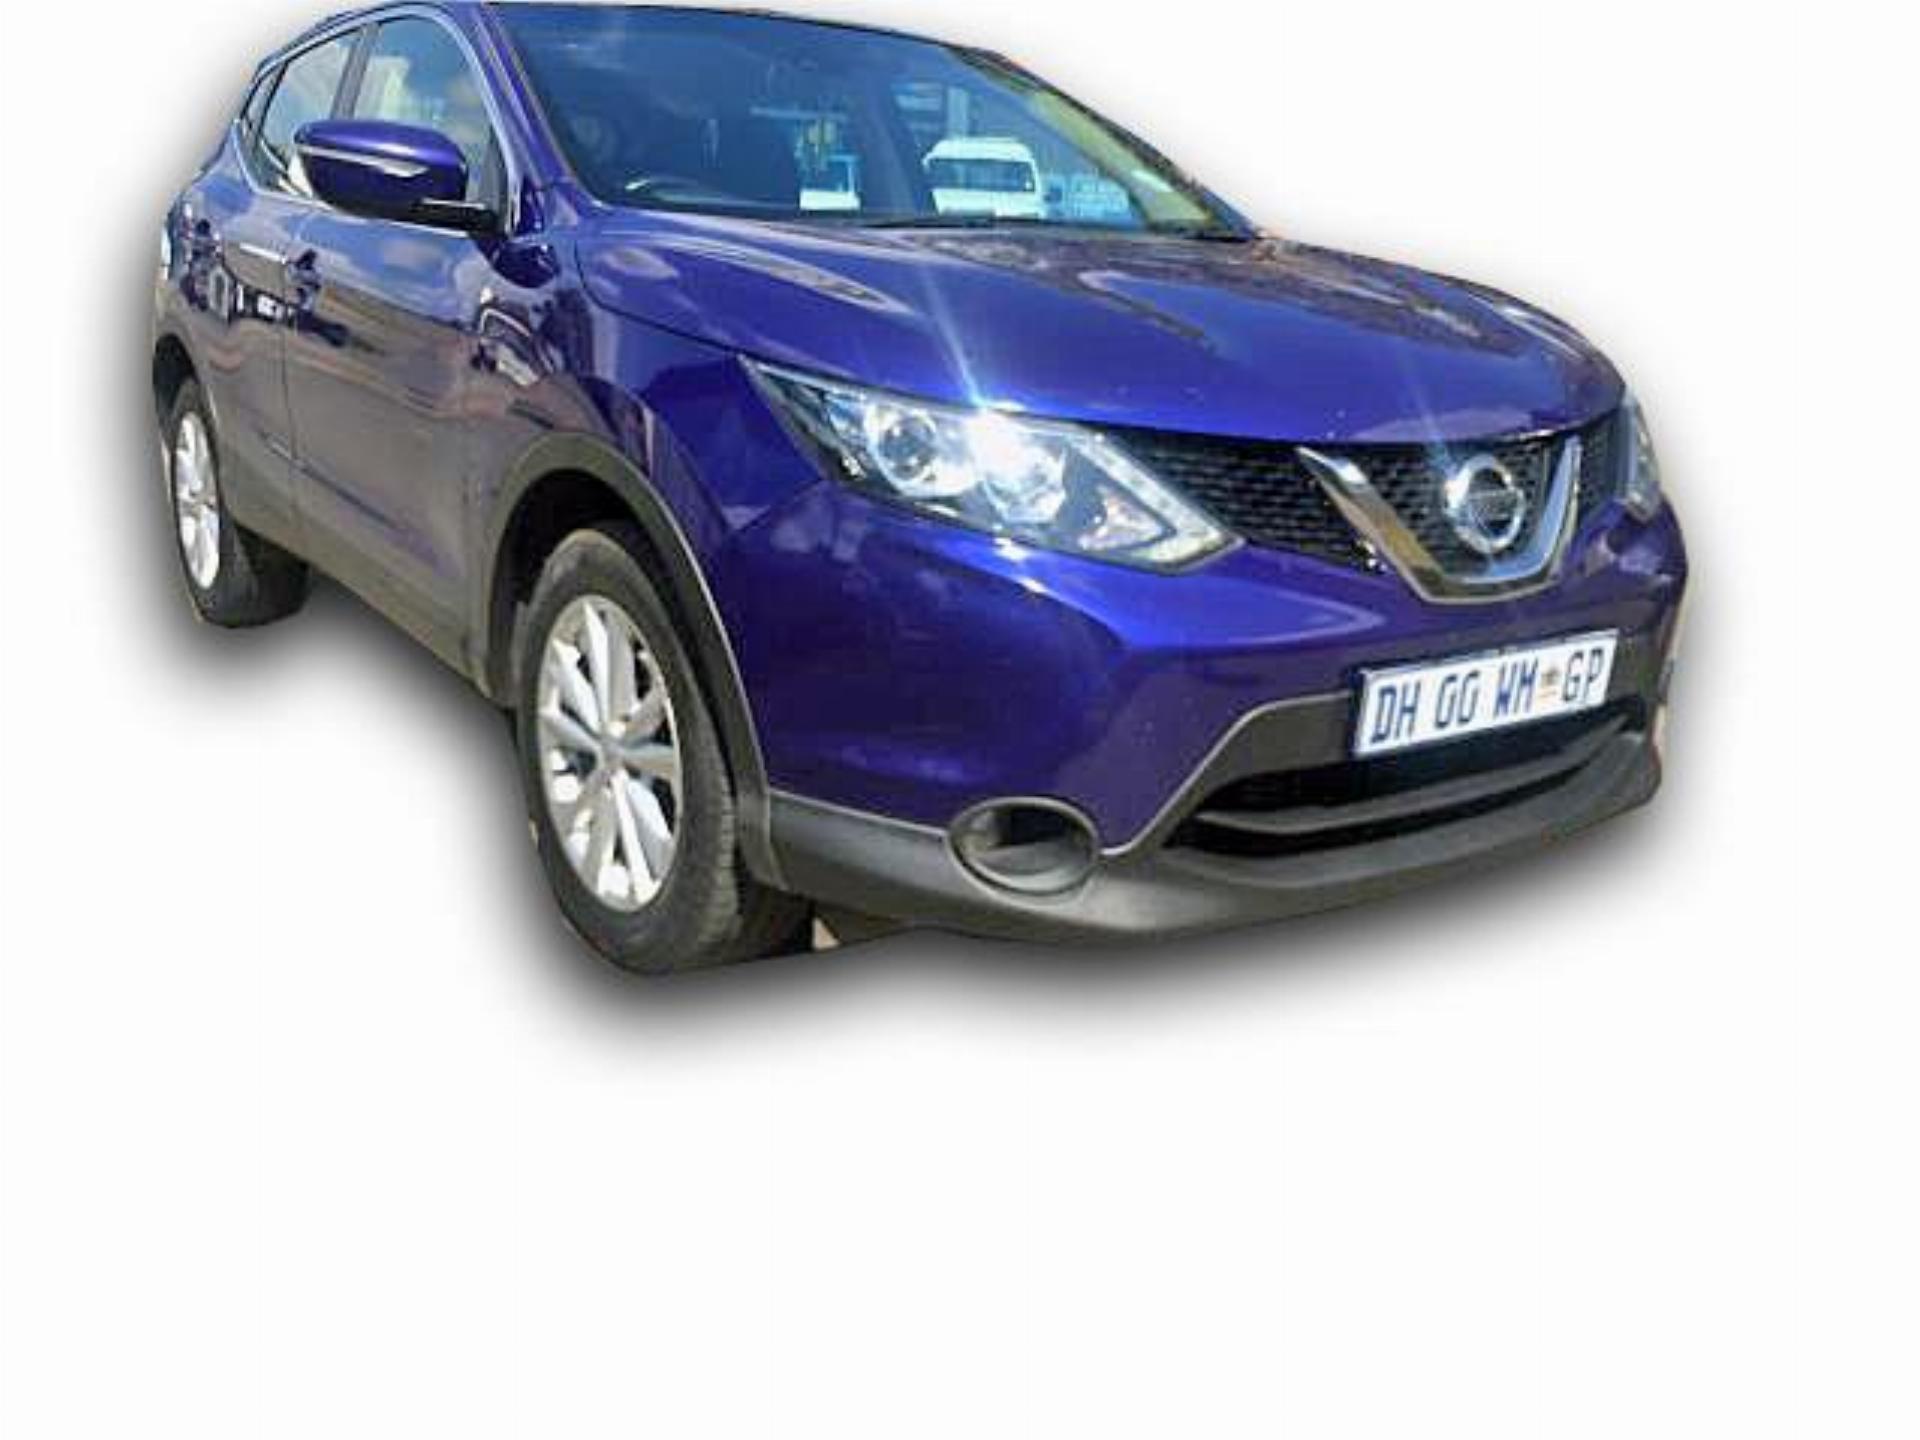 Nissan Qashqai 1.5 Dci Acenta Design Puredrive